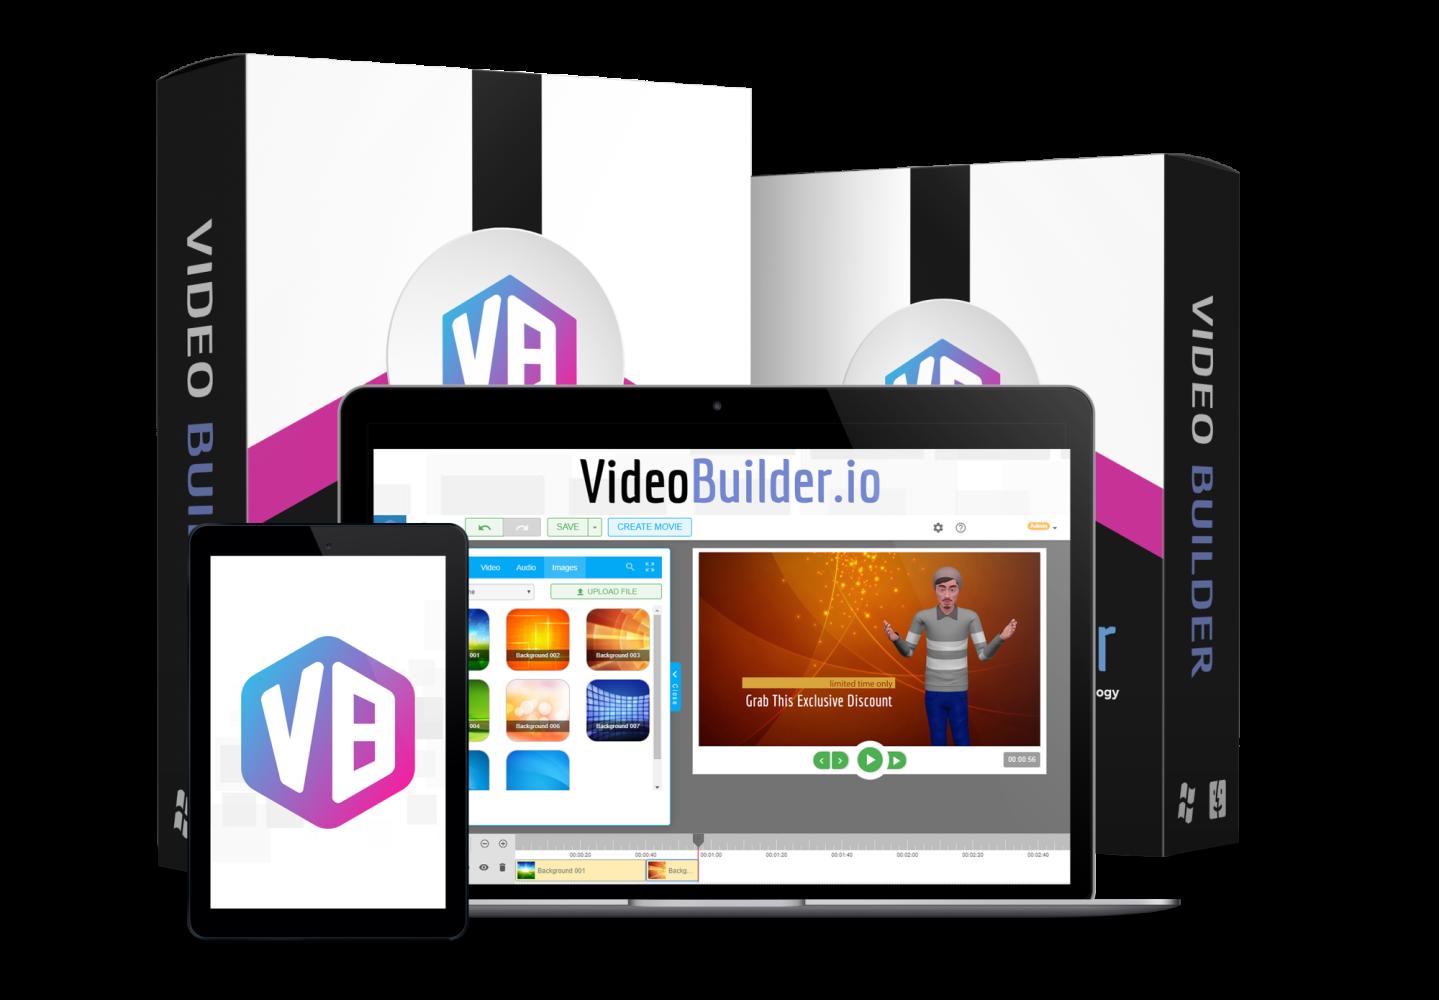 Revolutionary Video Maker App With